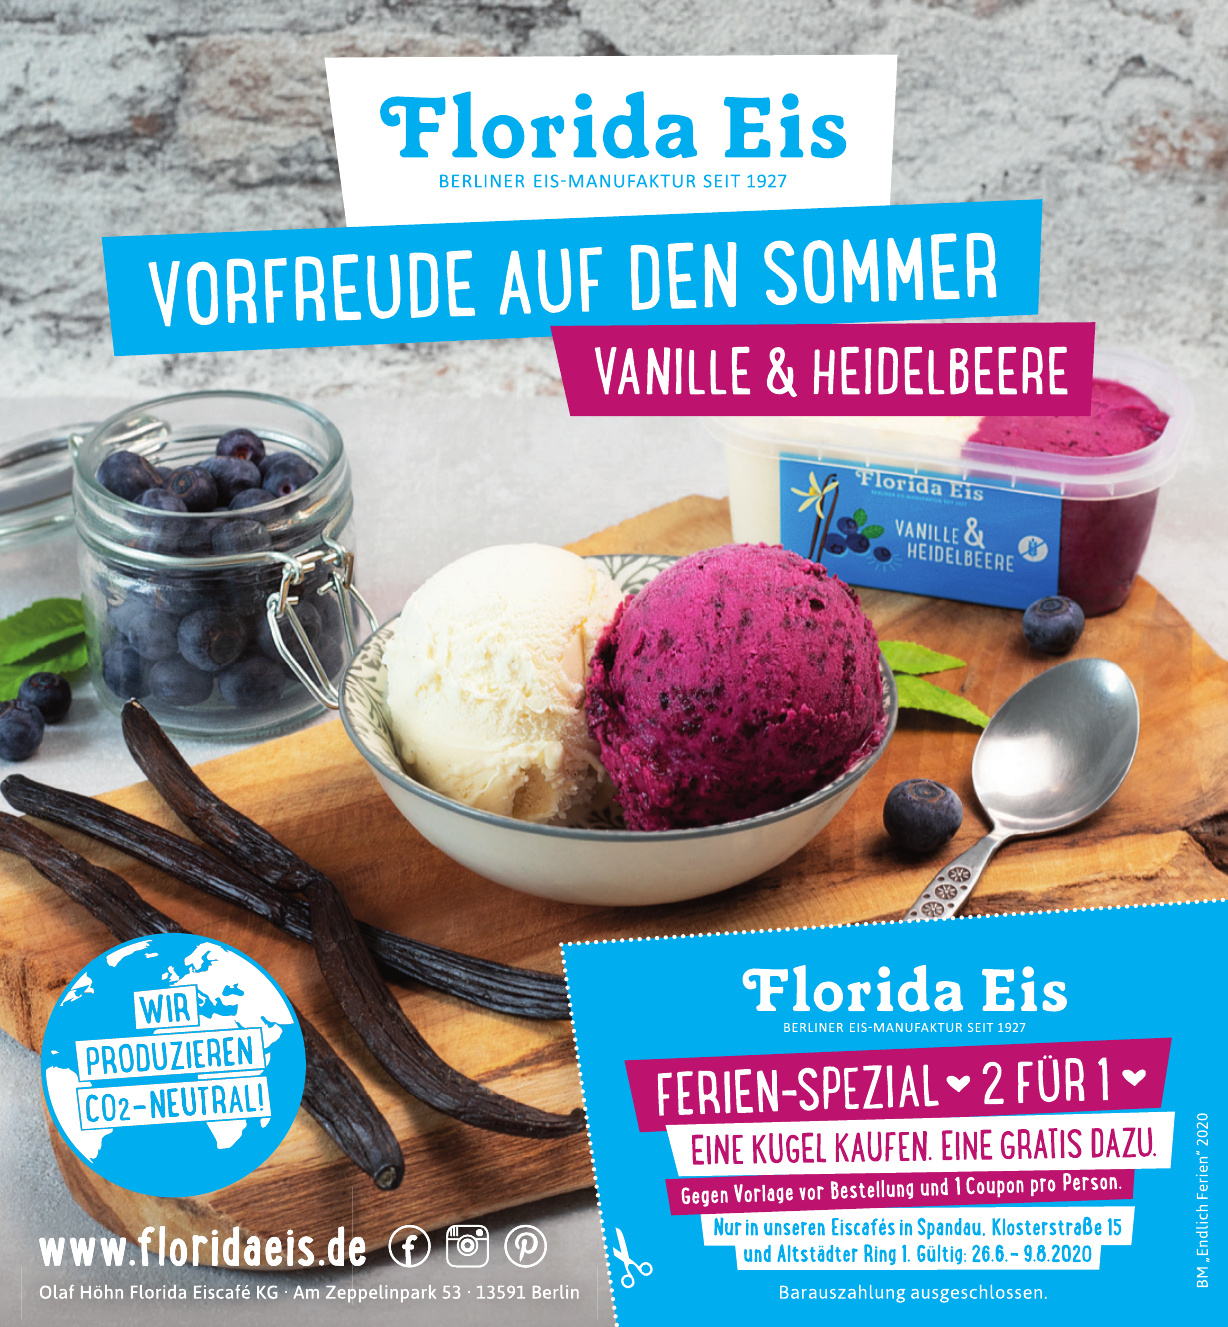 Florida- Eis Manufaktur GmbH